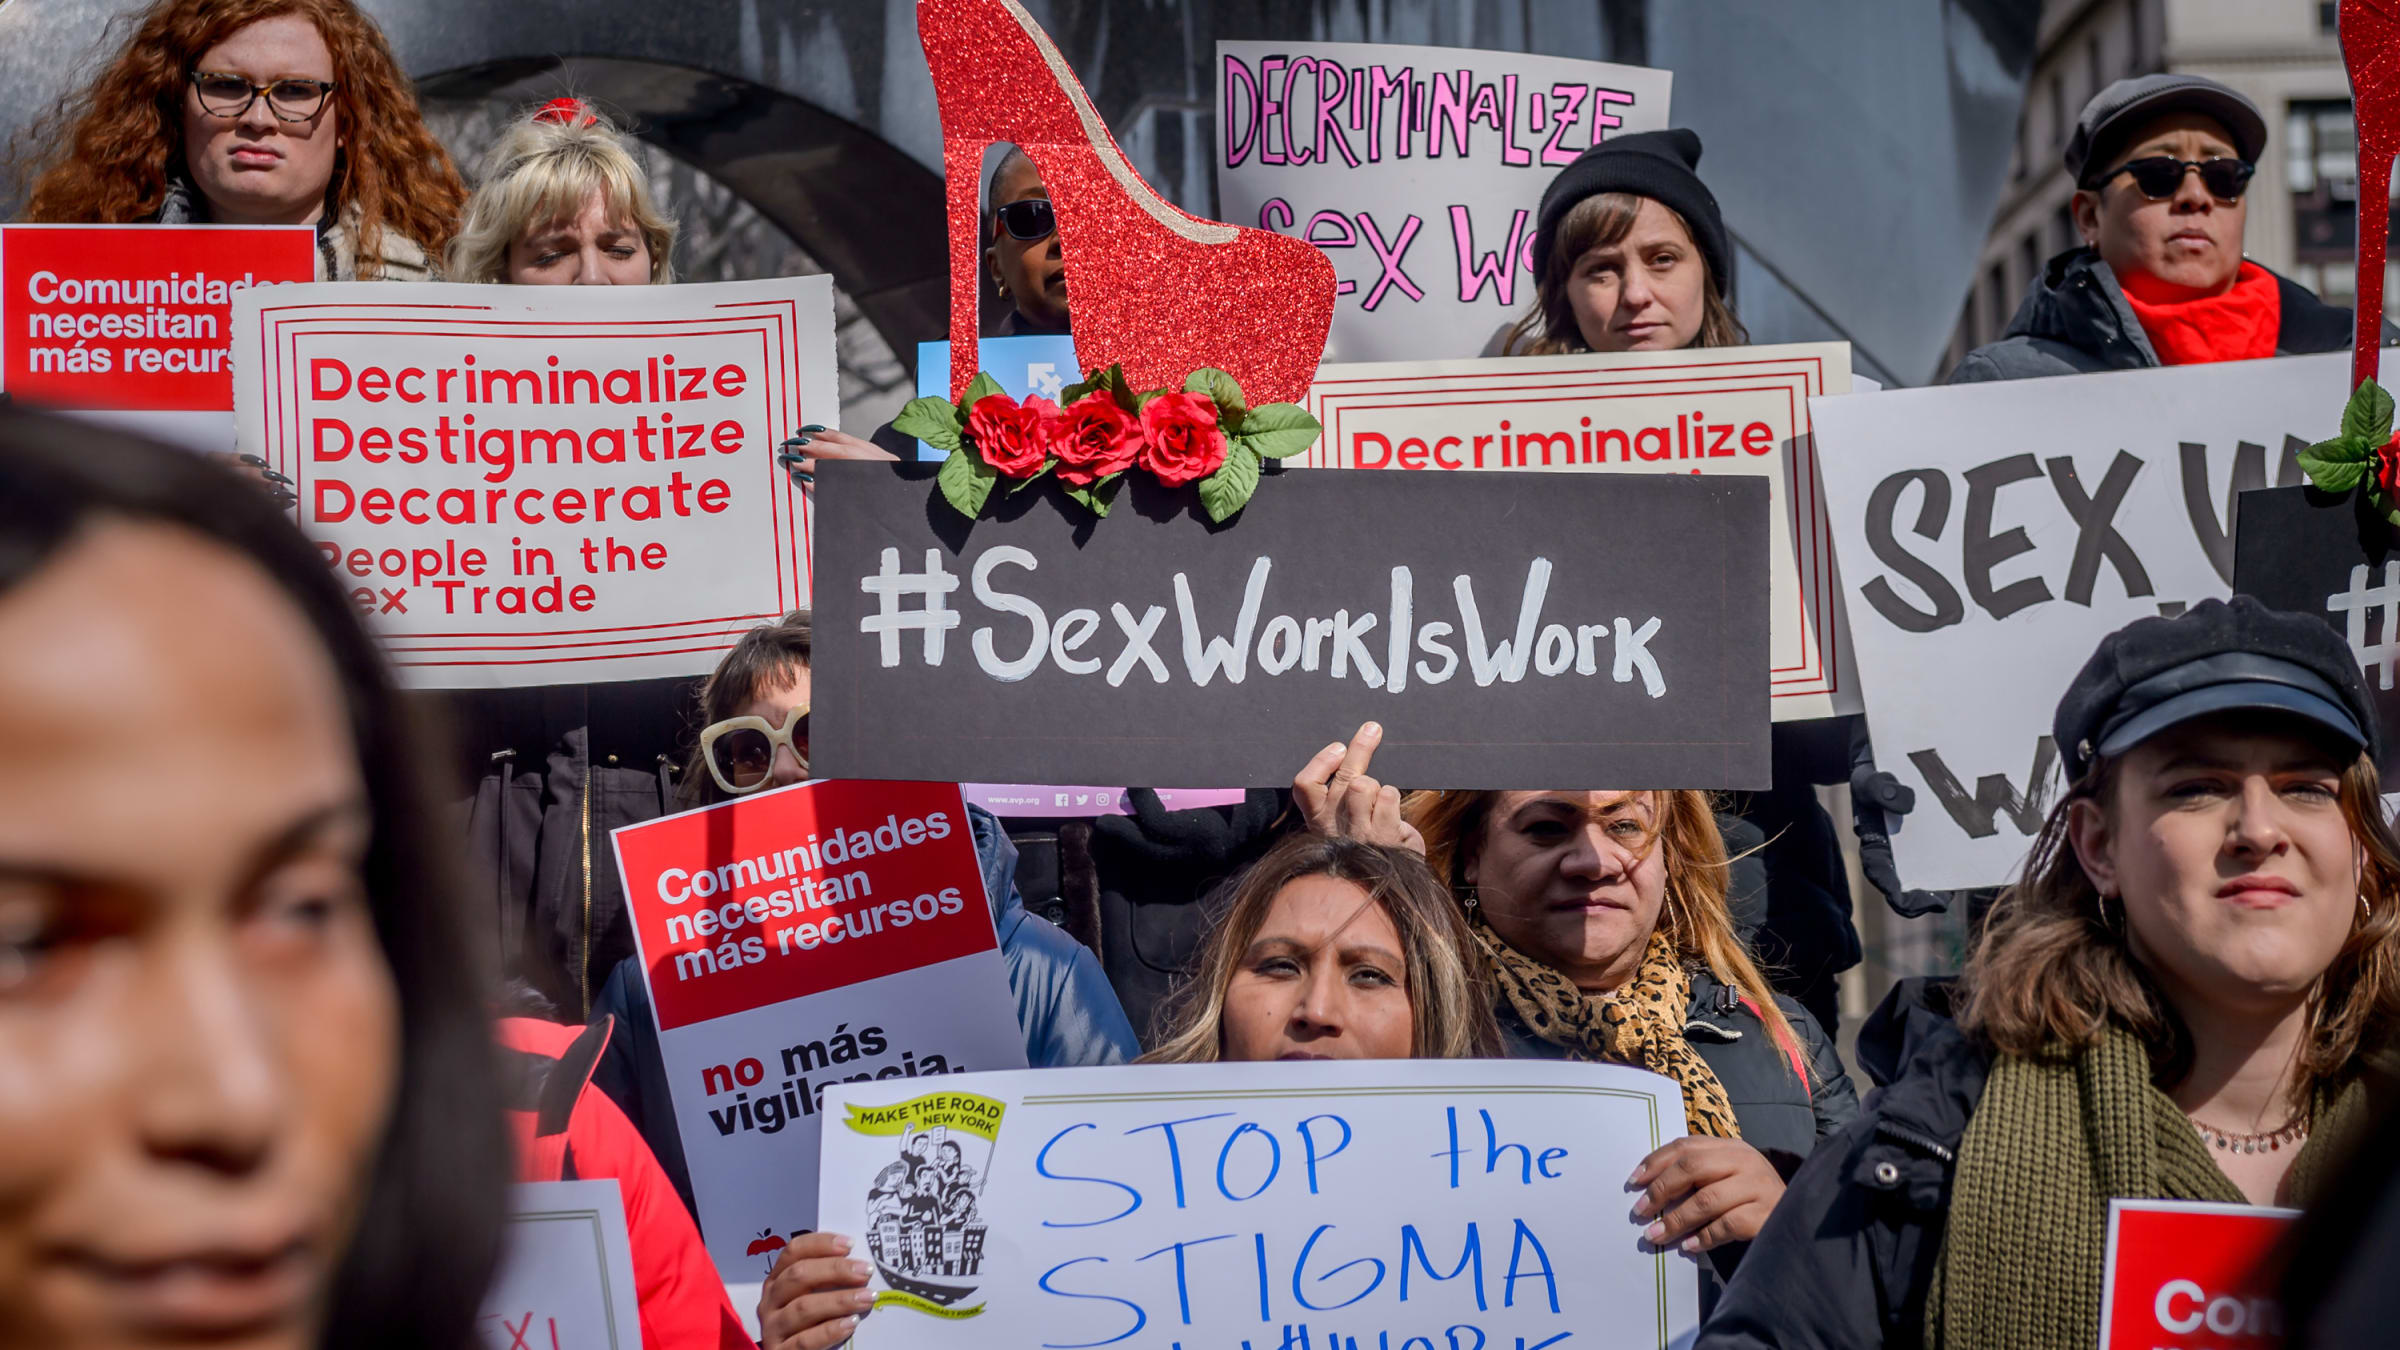 These Transgender Latinas Want New York State to Decriminalize Sex Work